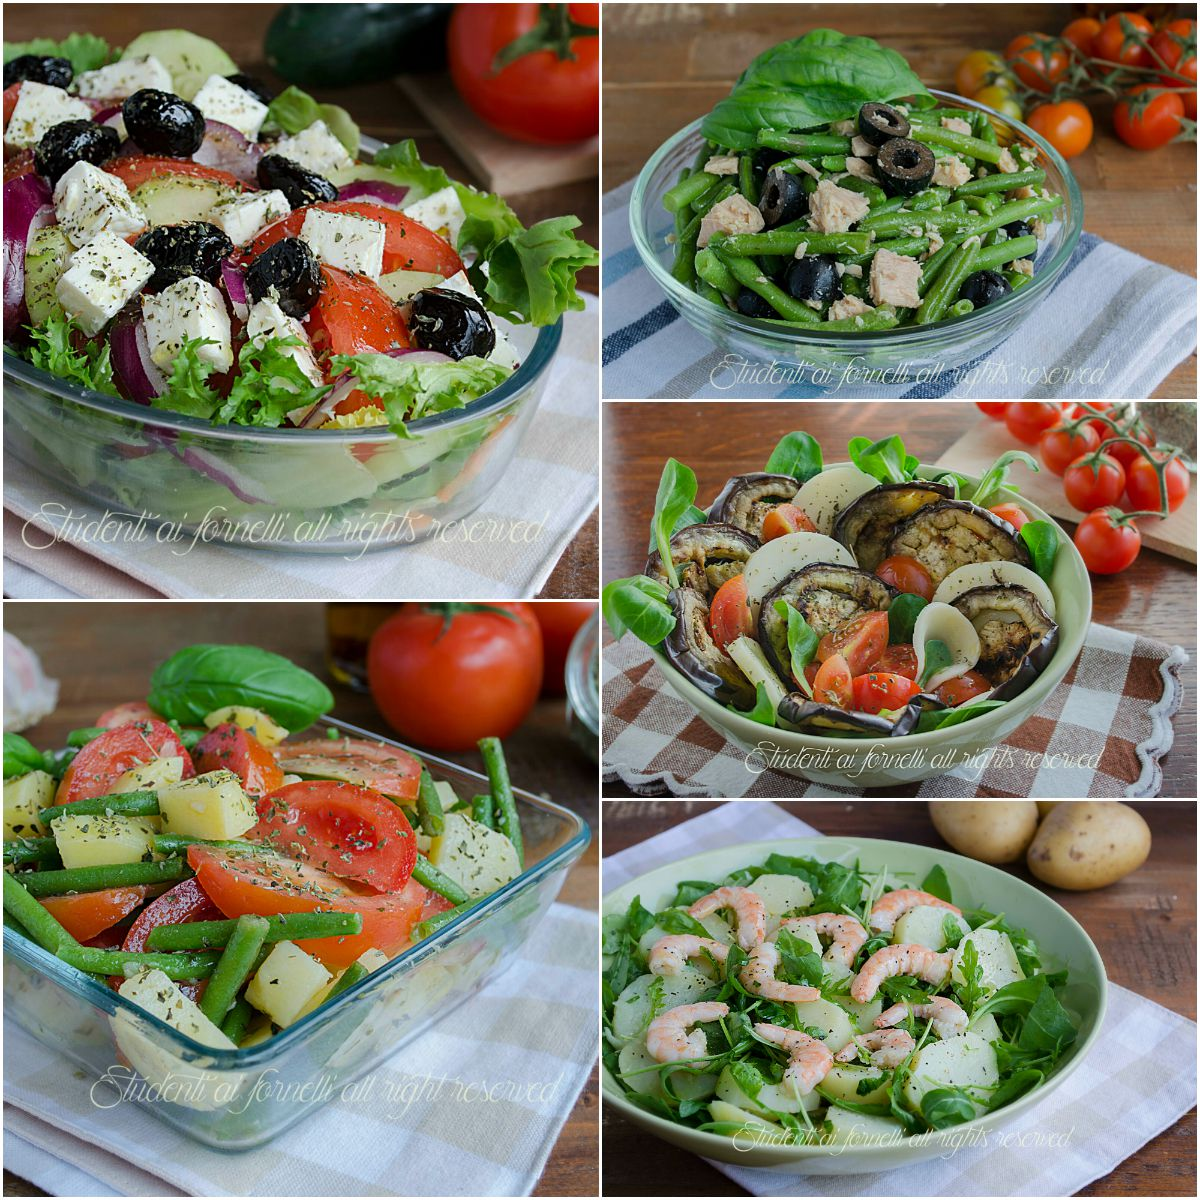 insalate fredde estive e piatti unici ricette sfiziose